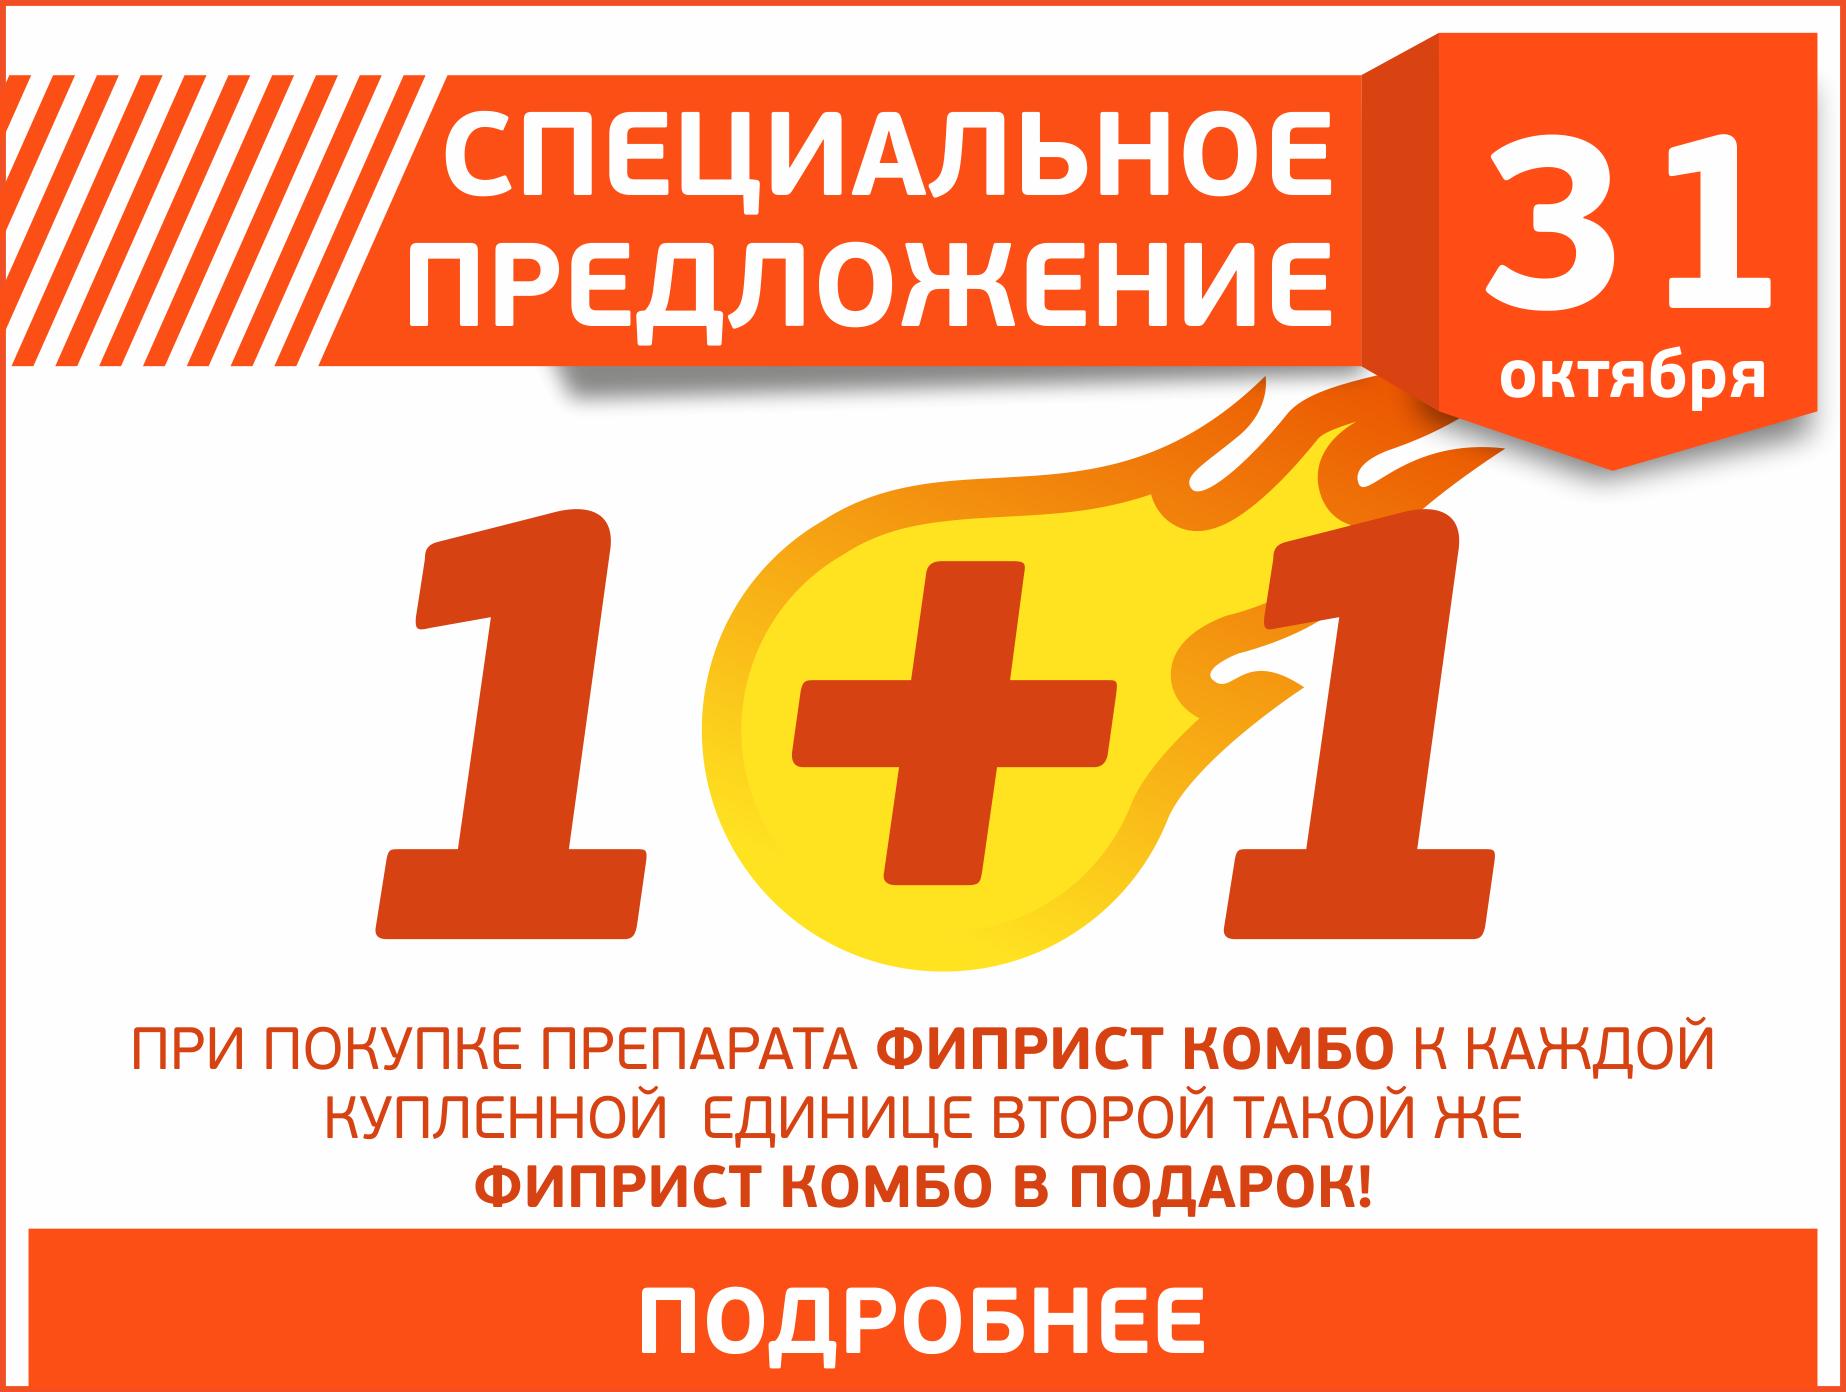 ФИПРИСТ КОМБО 1+1